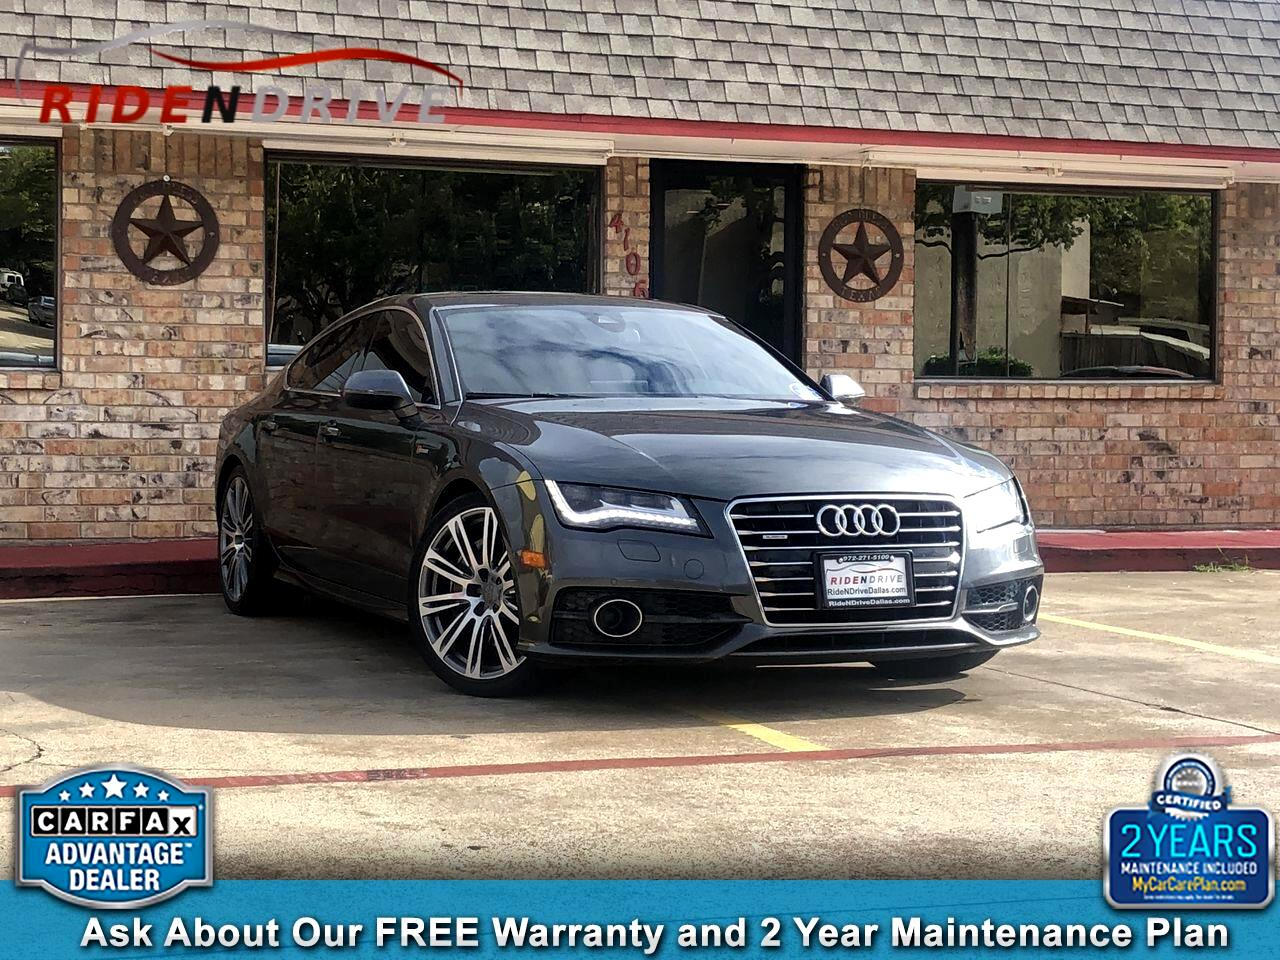 2012 Audi A7 4dr HB quattro 3.0 Prestige